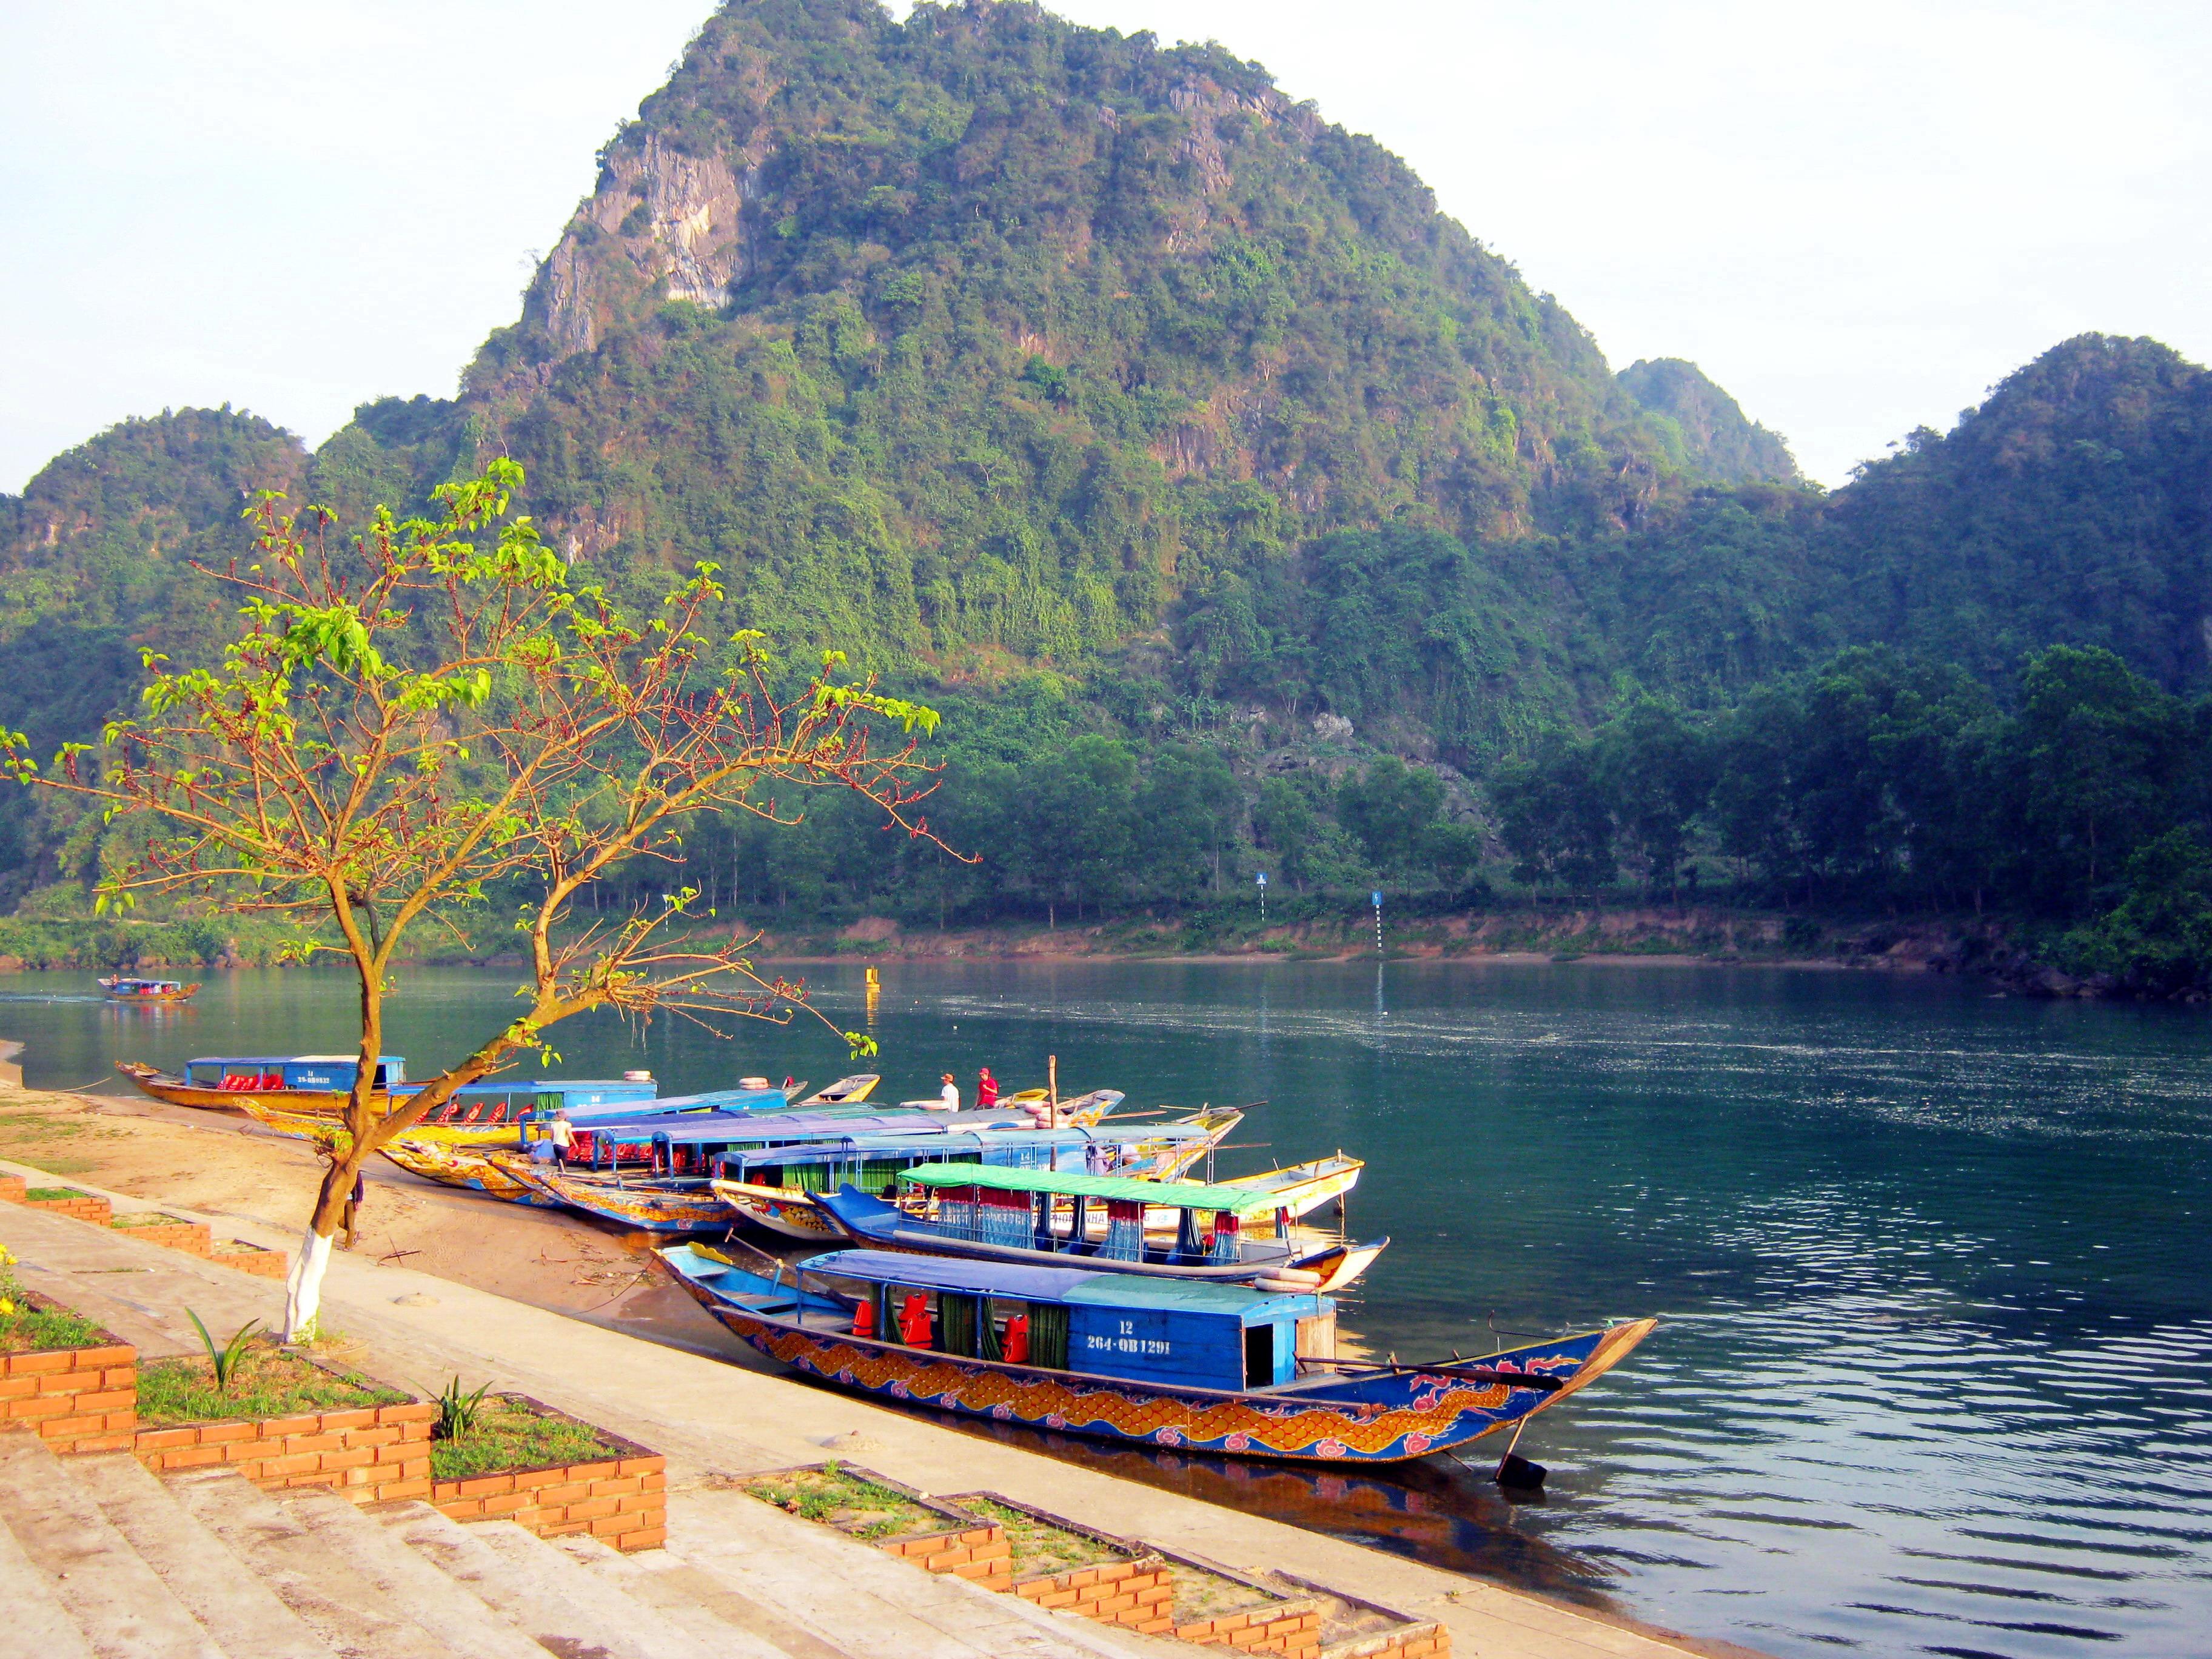 phong-nha-tien-son-cave-tour